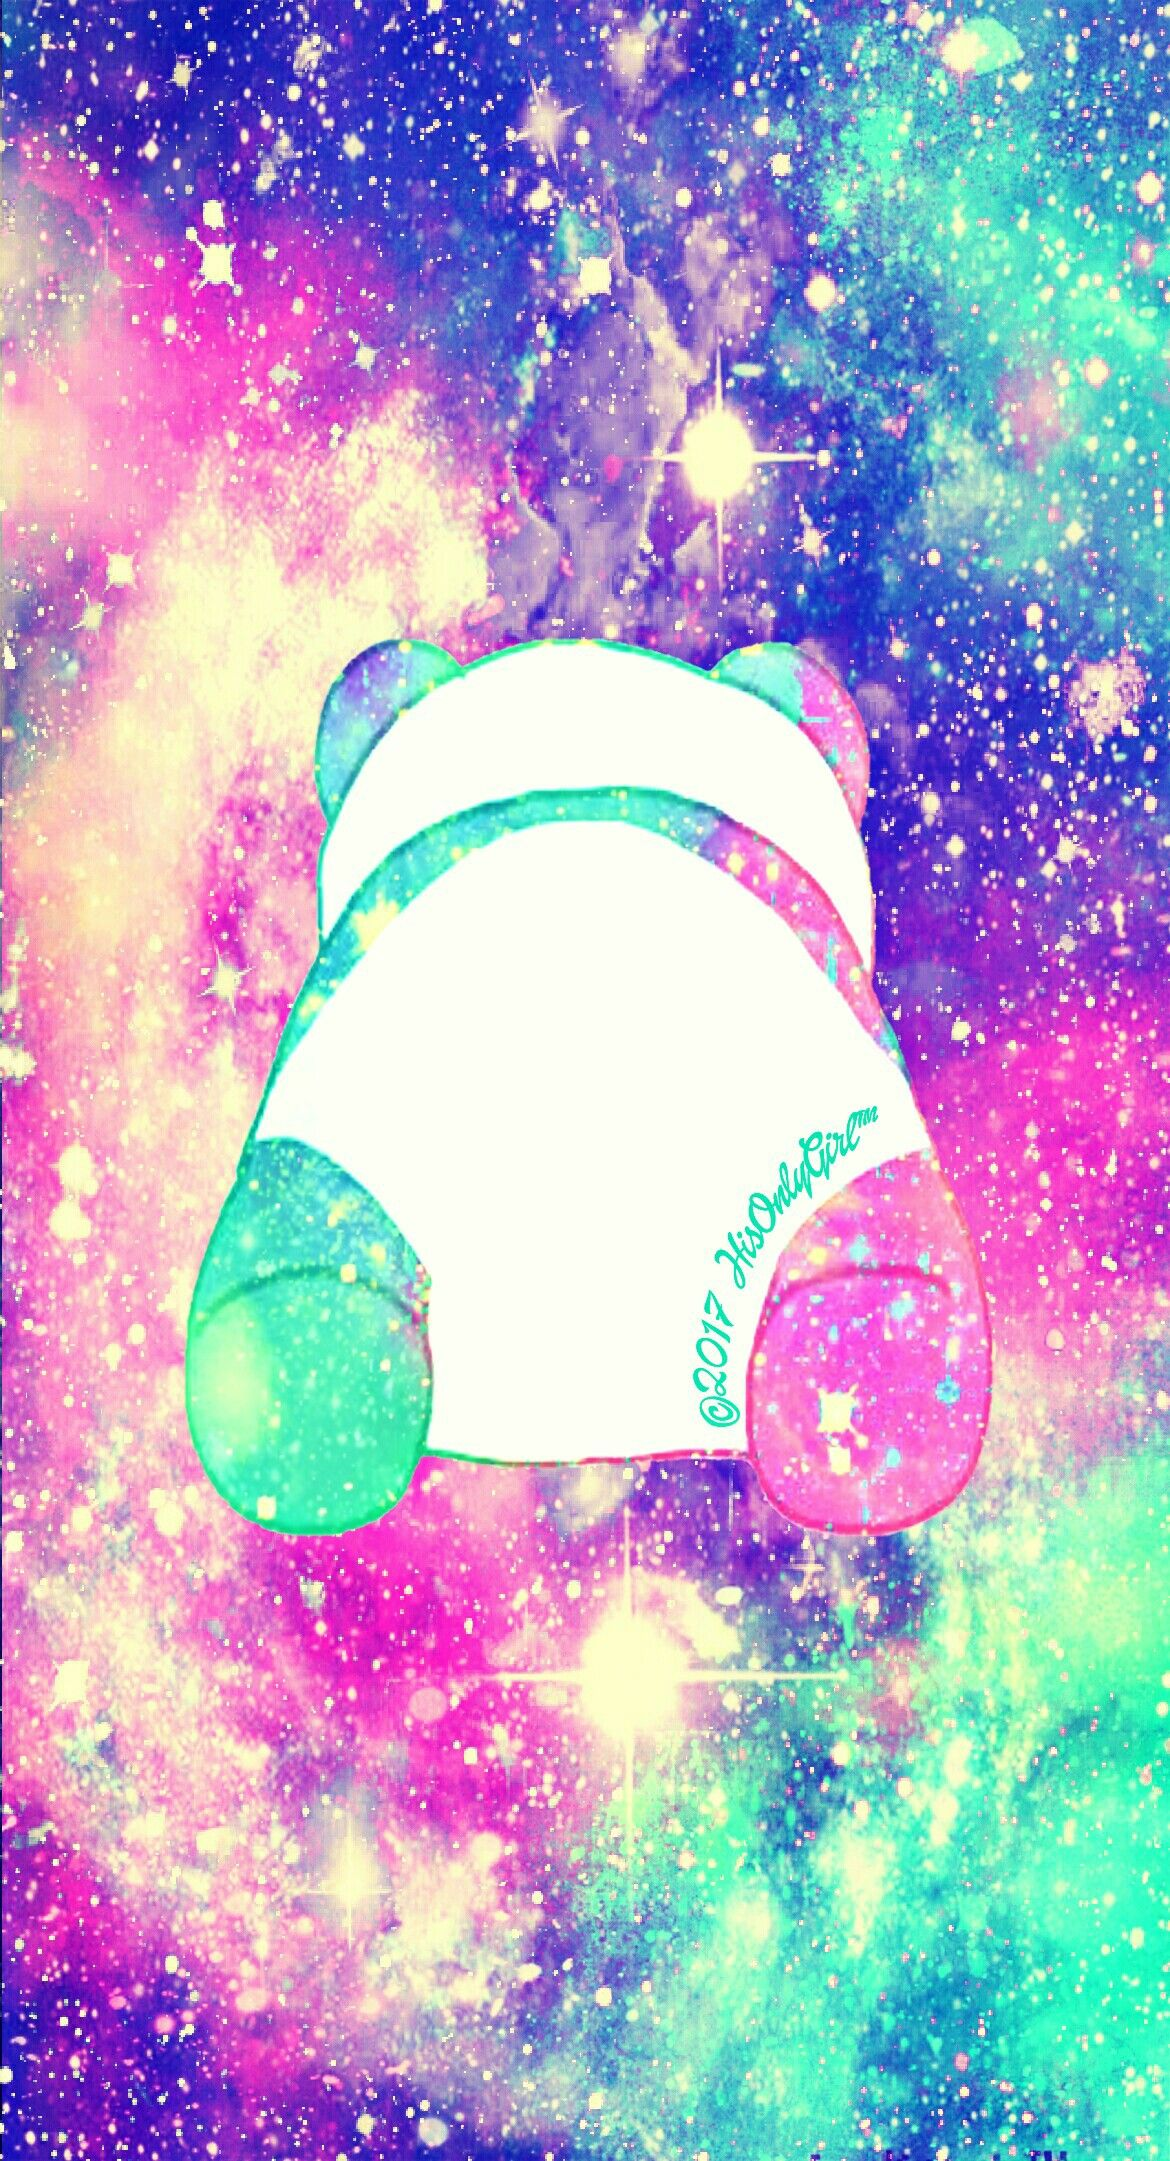 Colorful Panda Cheeks Galaxy Wallpaper I Created For The App Cocoppa Cute Galaxy Wallpaper Cool Galaxy Wallpapers Panda Background